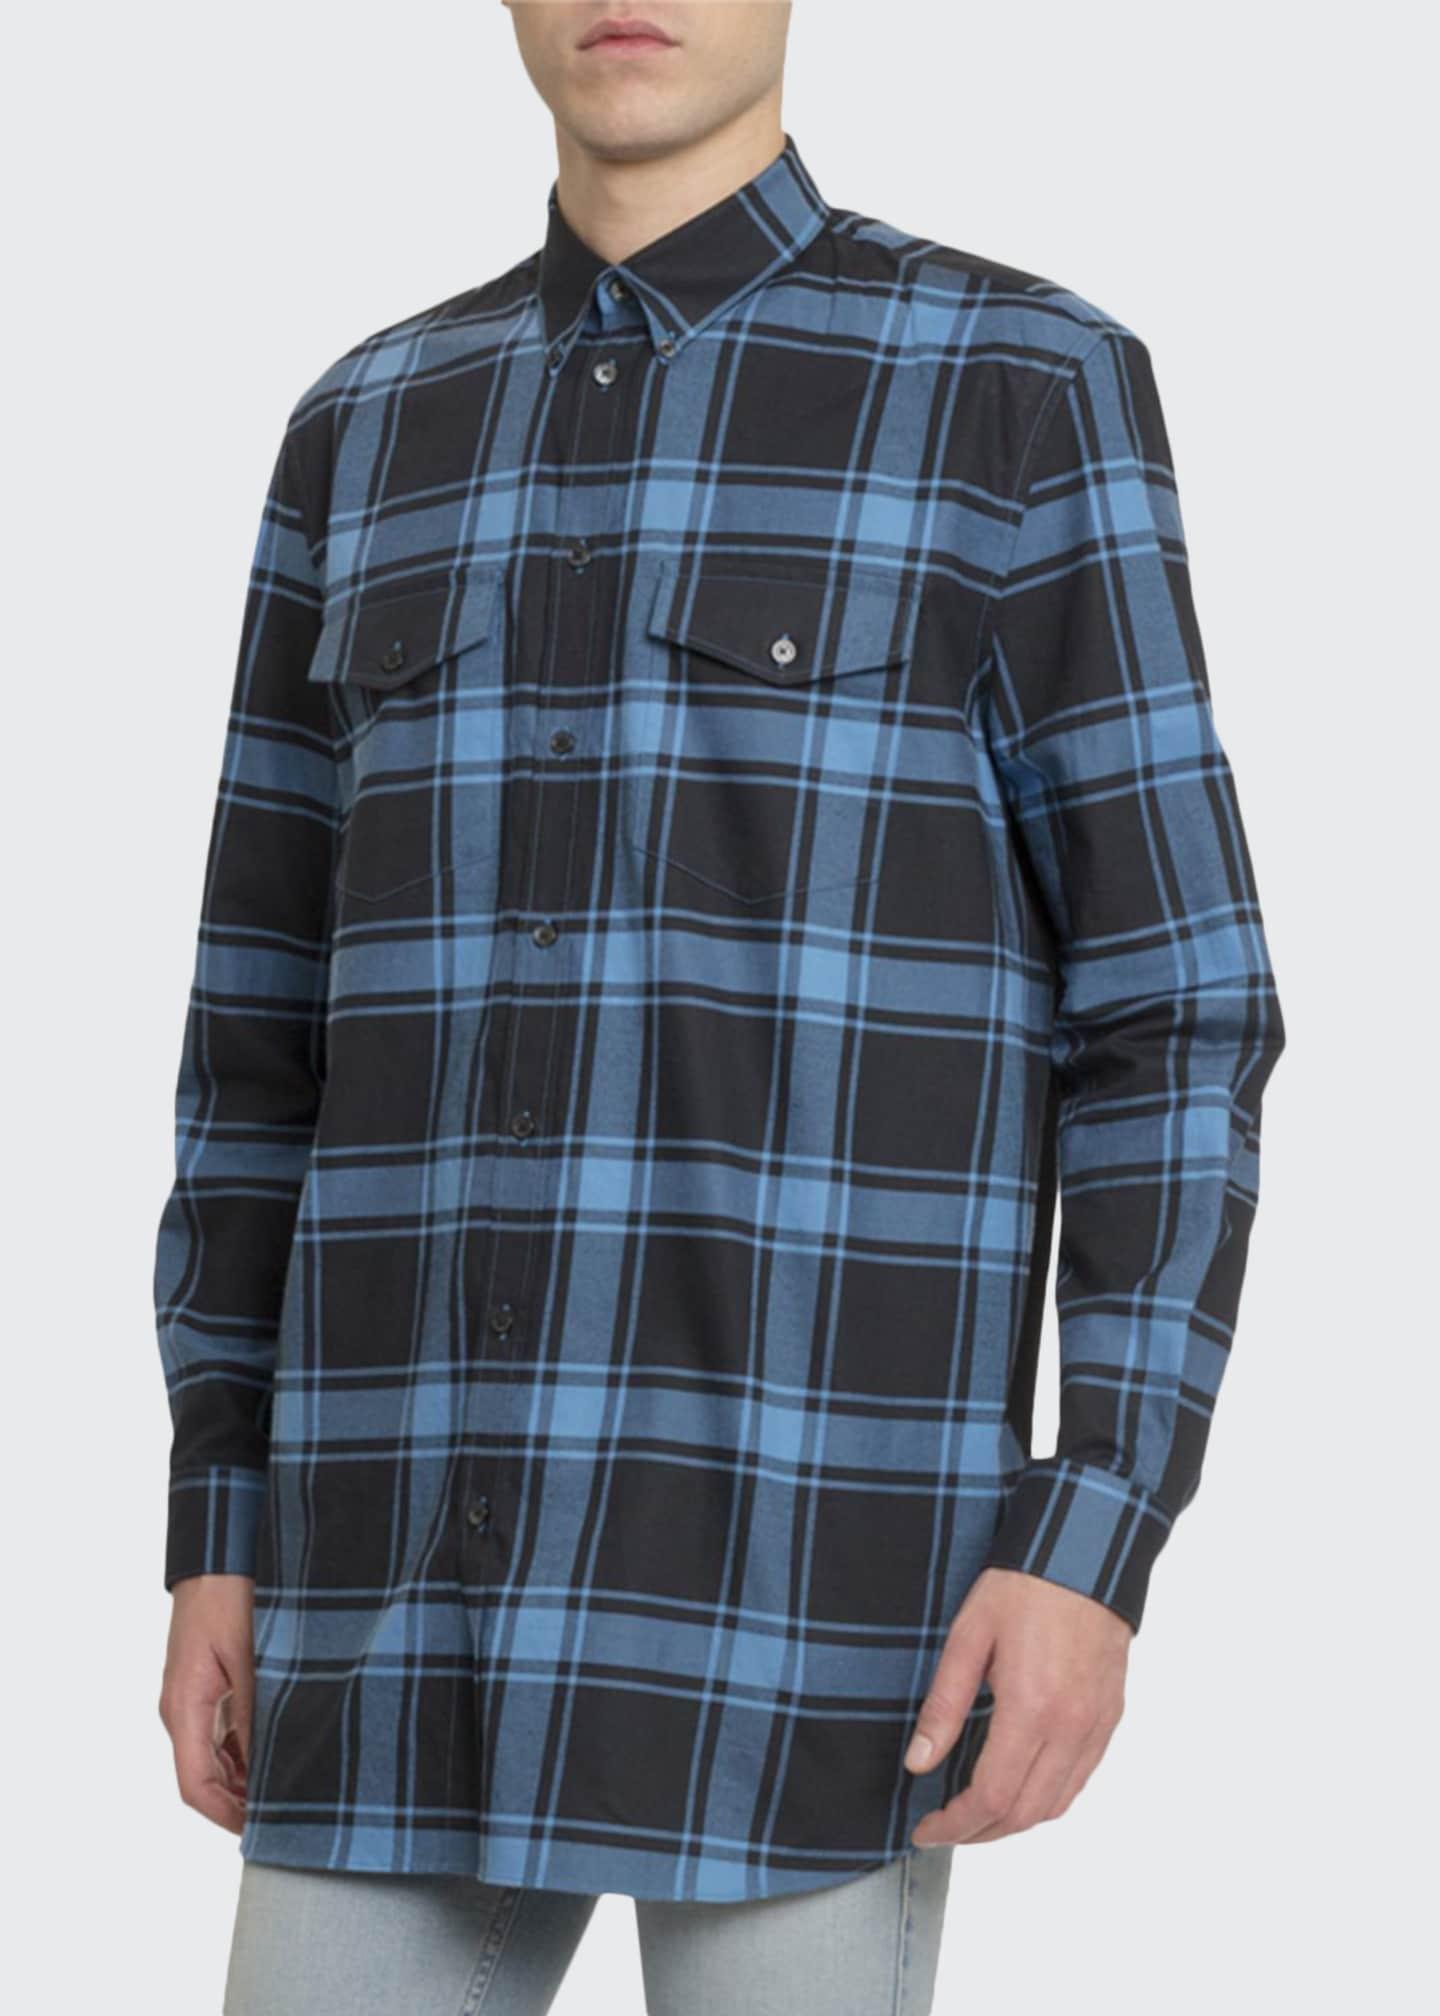 Givenchy Men's Plaid Classic Sport Shirt w/ Tape